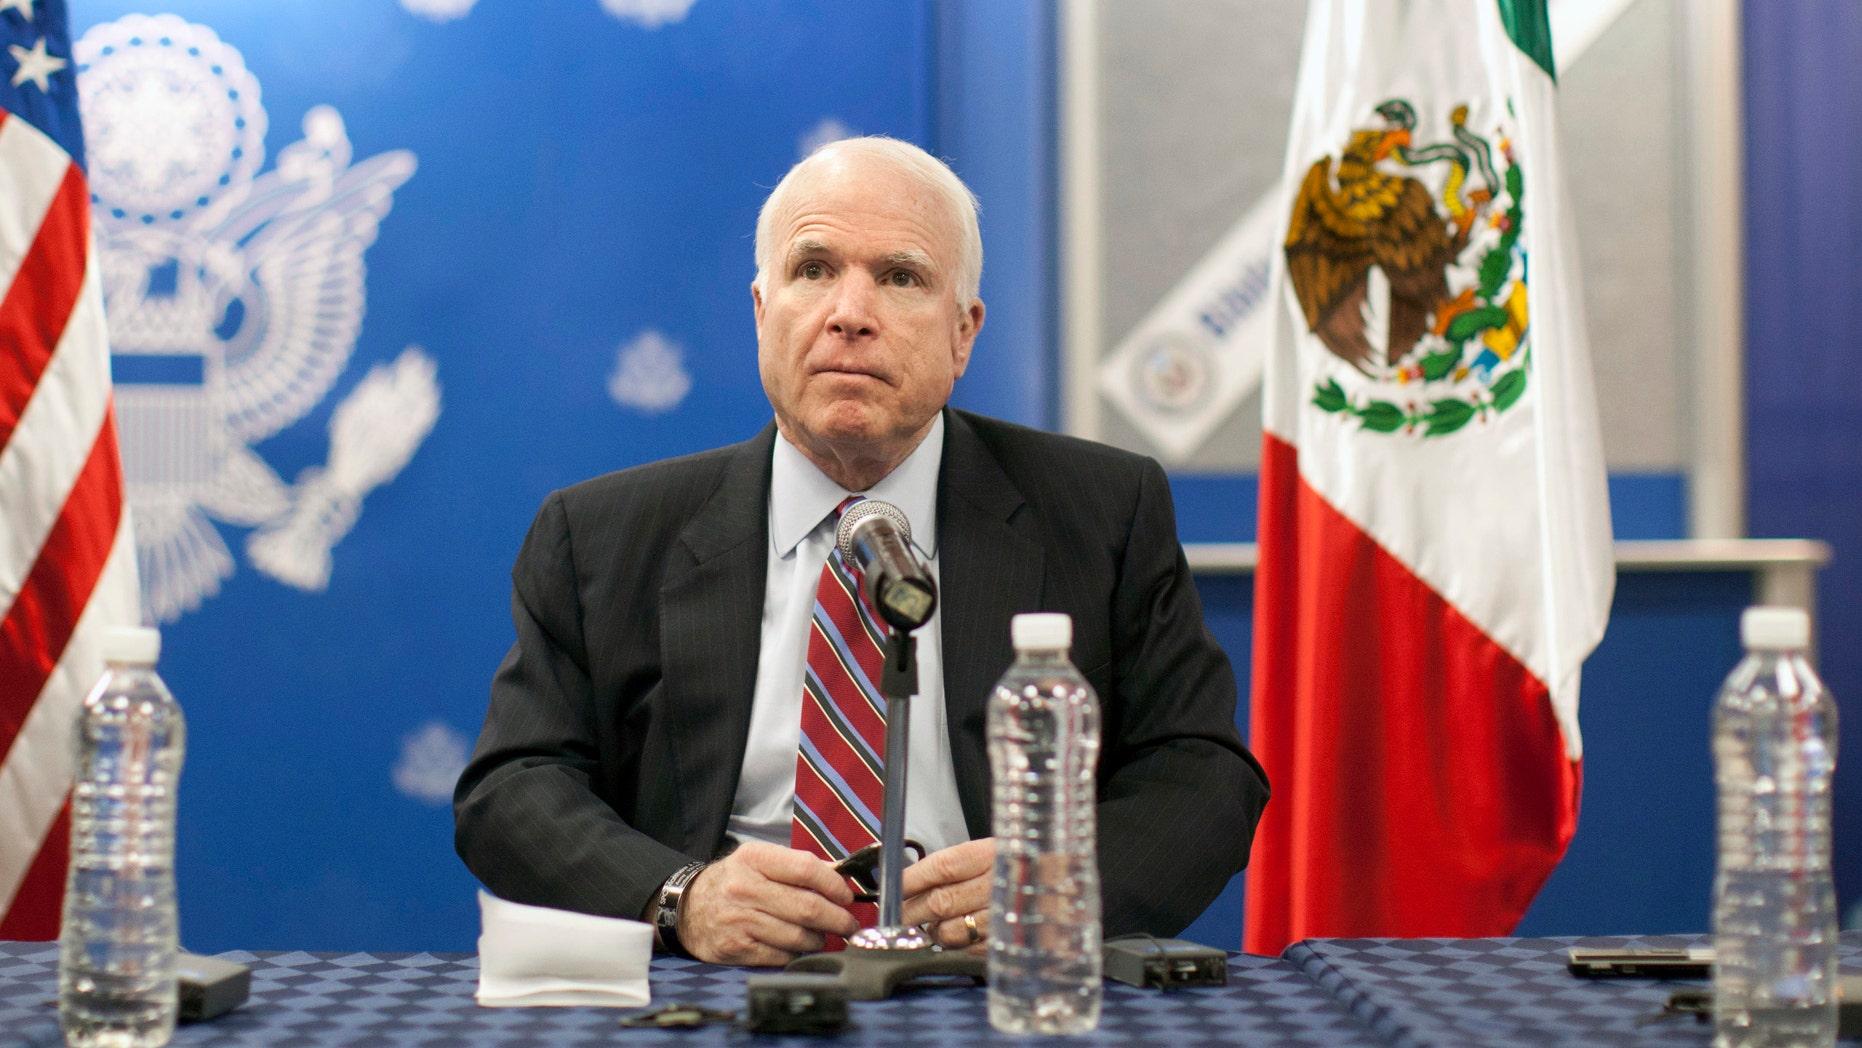 Republican Sen. John McCain, from Arizona, pauses during a press conference in Mexico City, Friday, Feb. 22, 2013.  (AP Photo/Alexandre Meneghini)